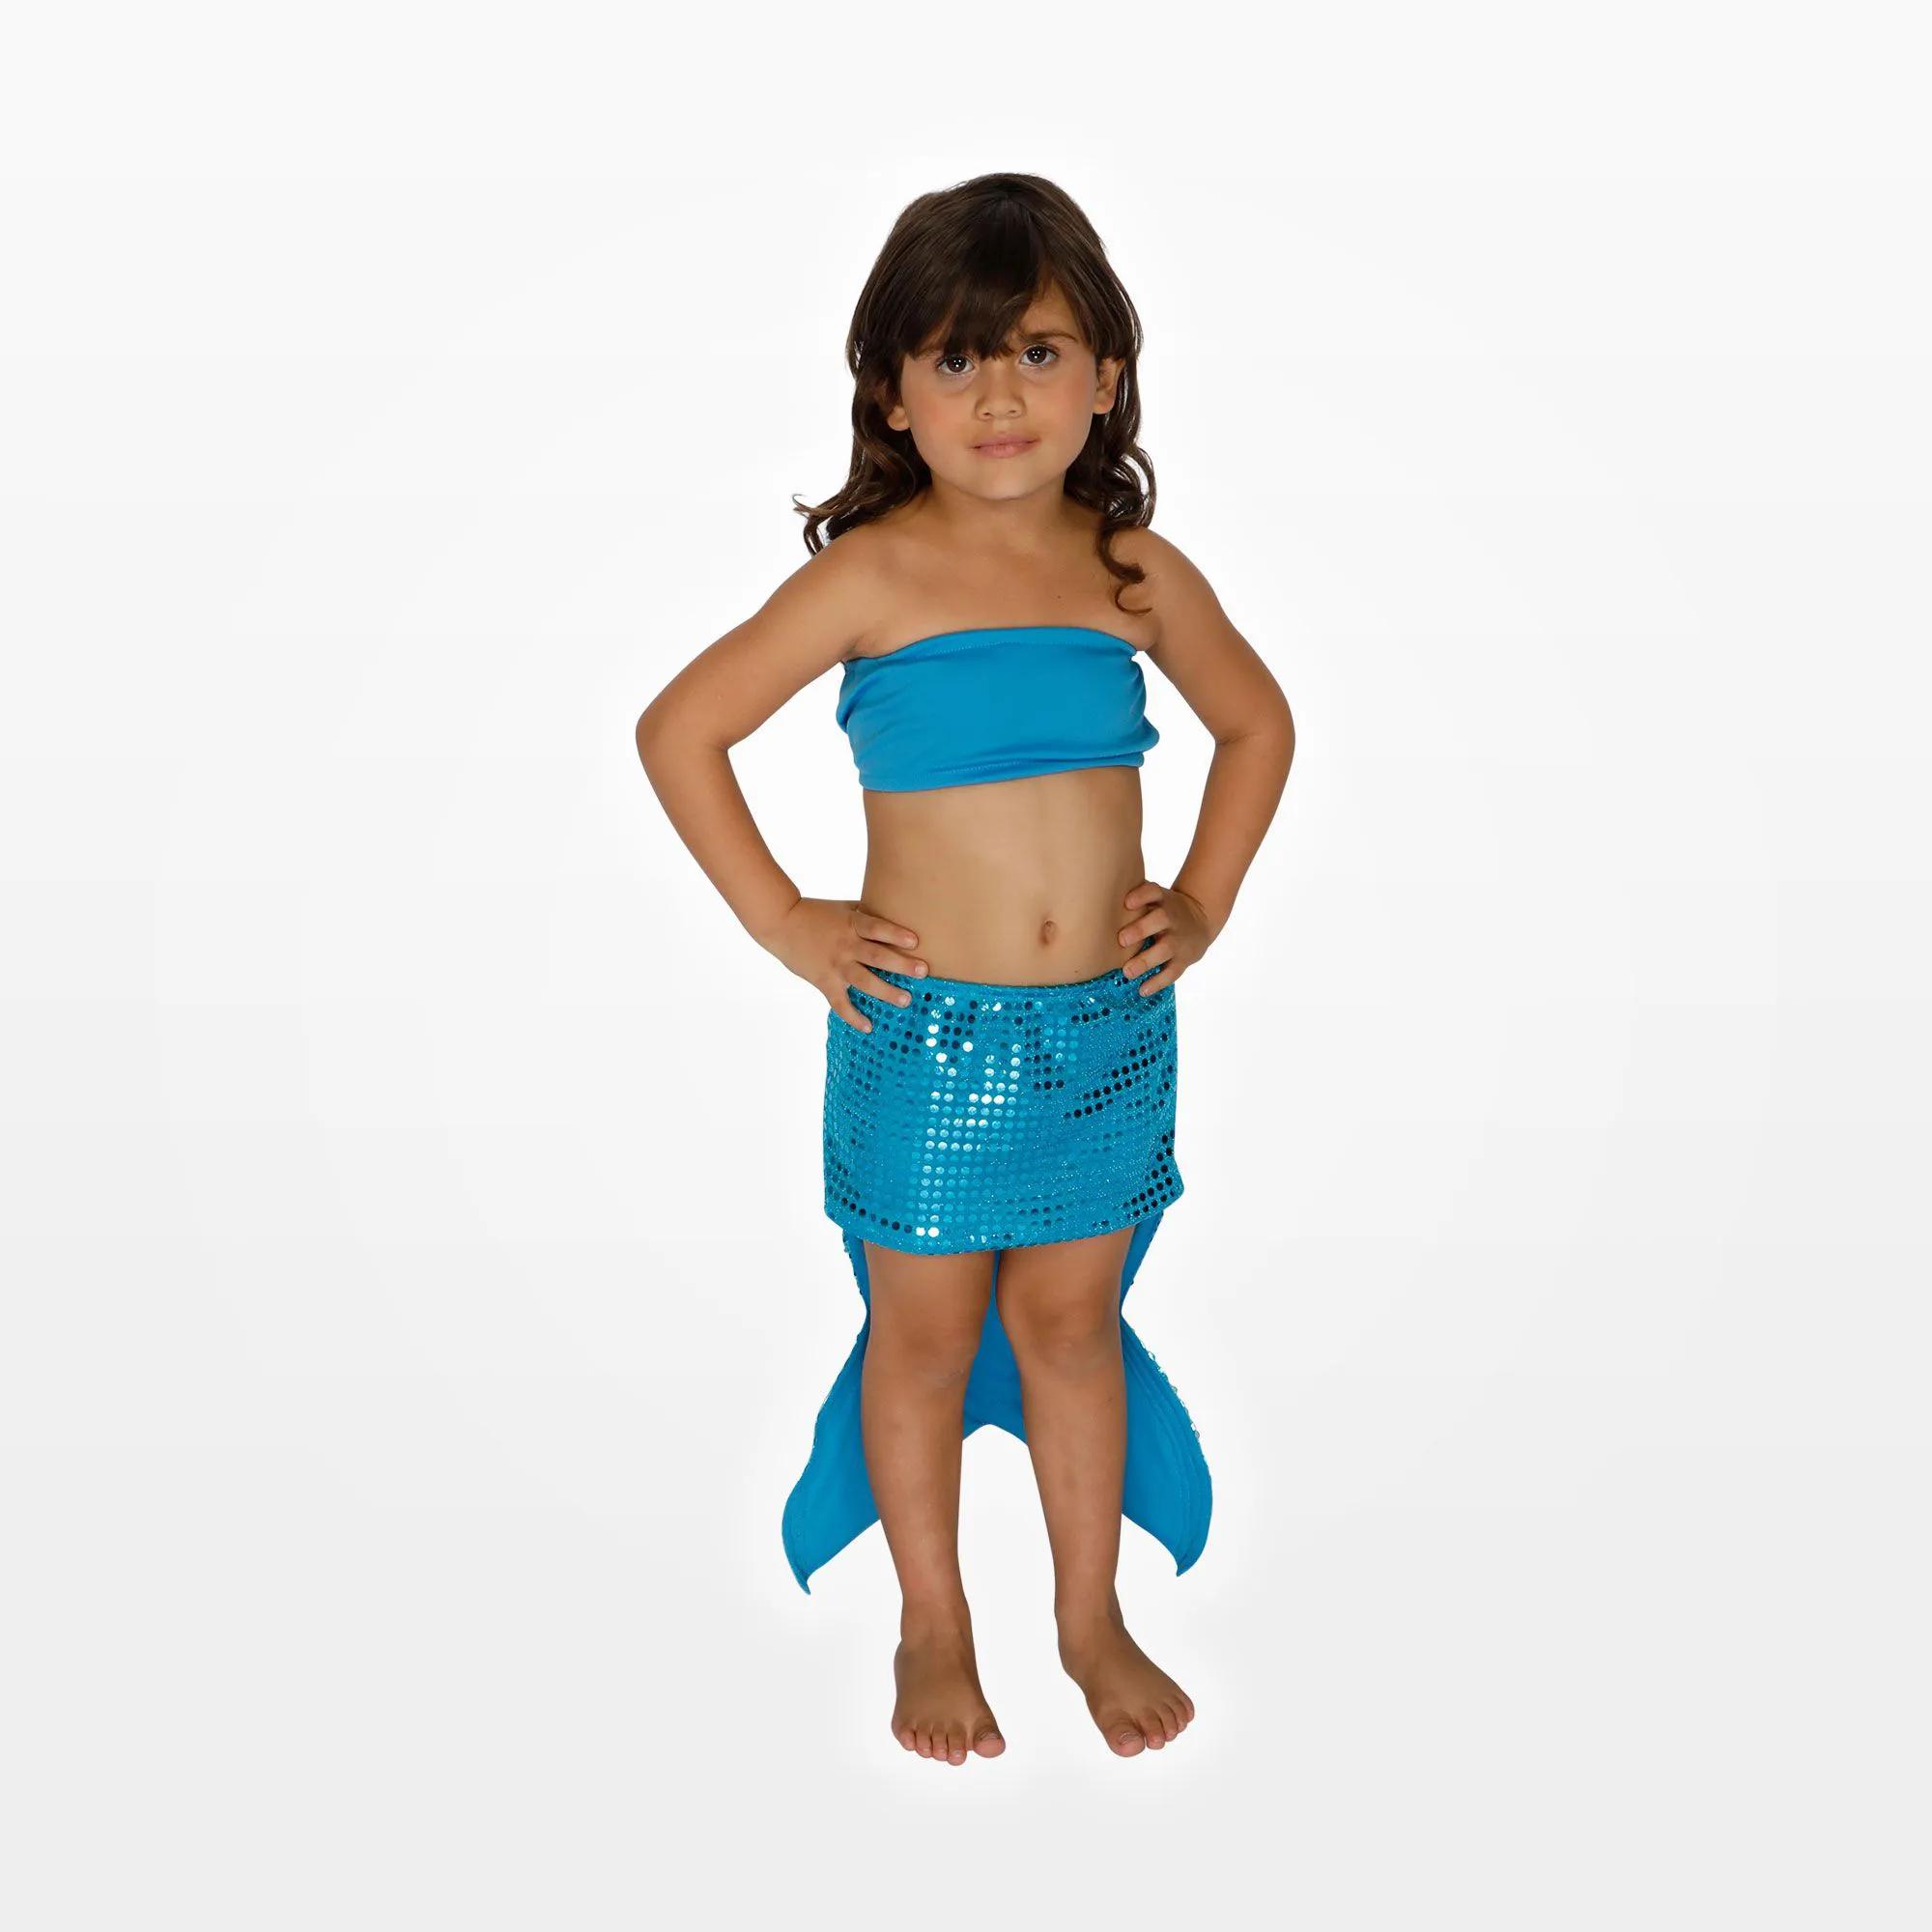 Fantasia Sereia Saia e Top Infantil